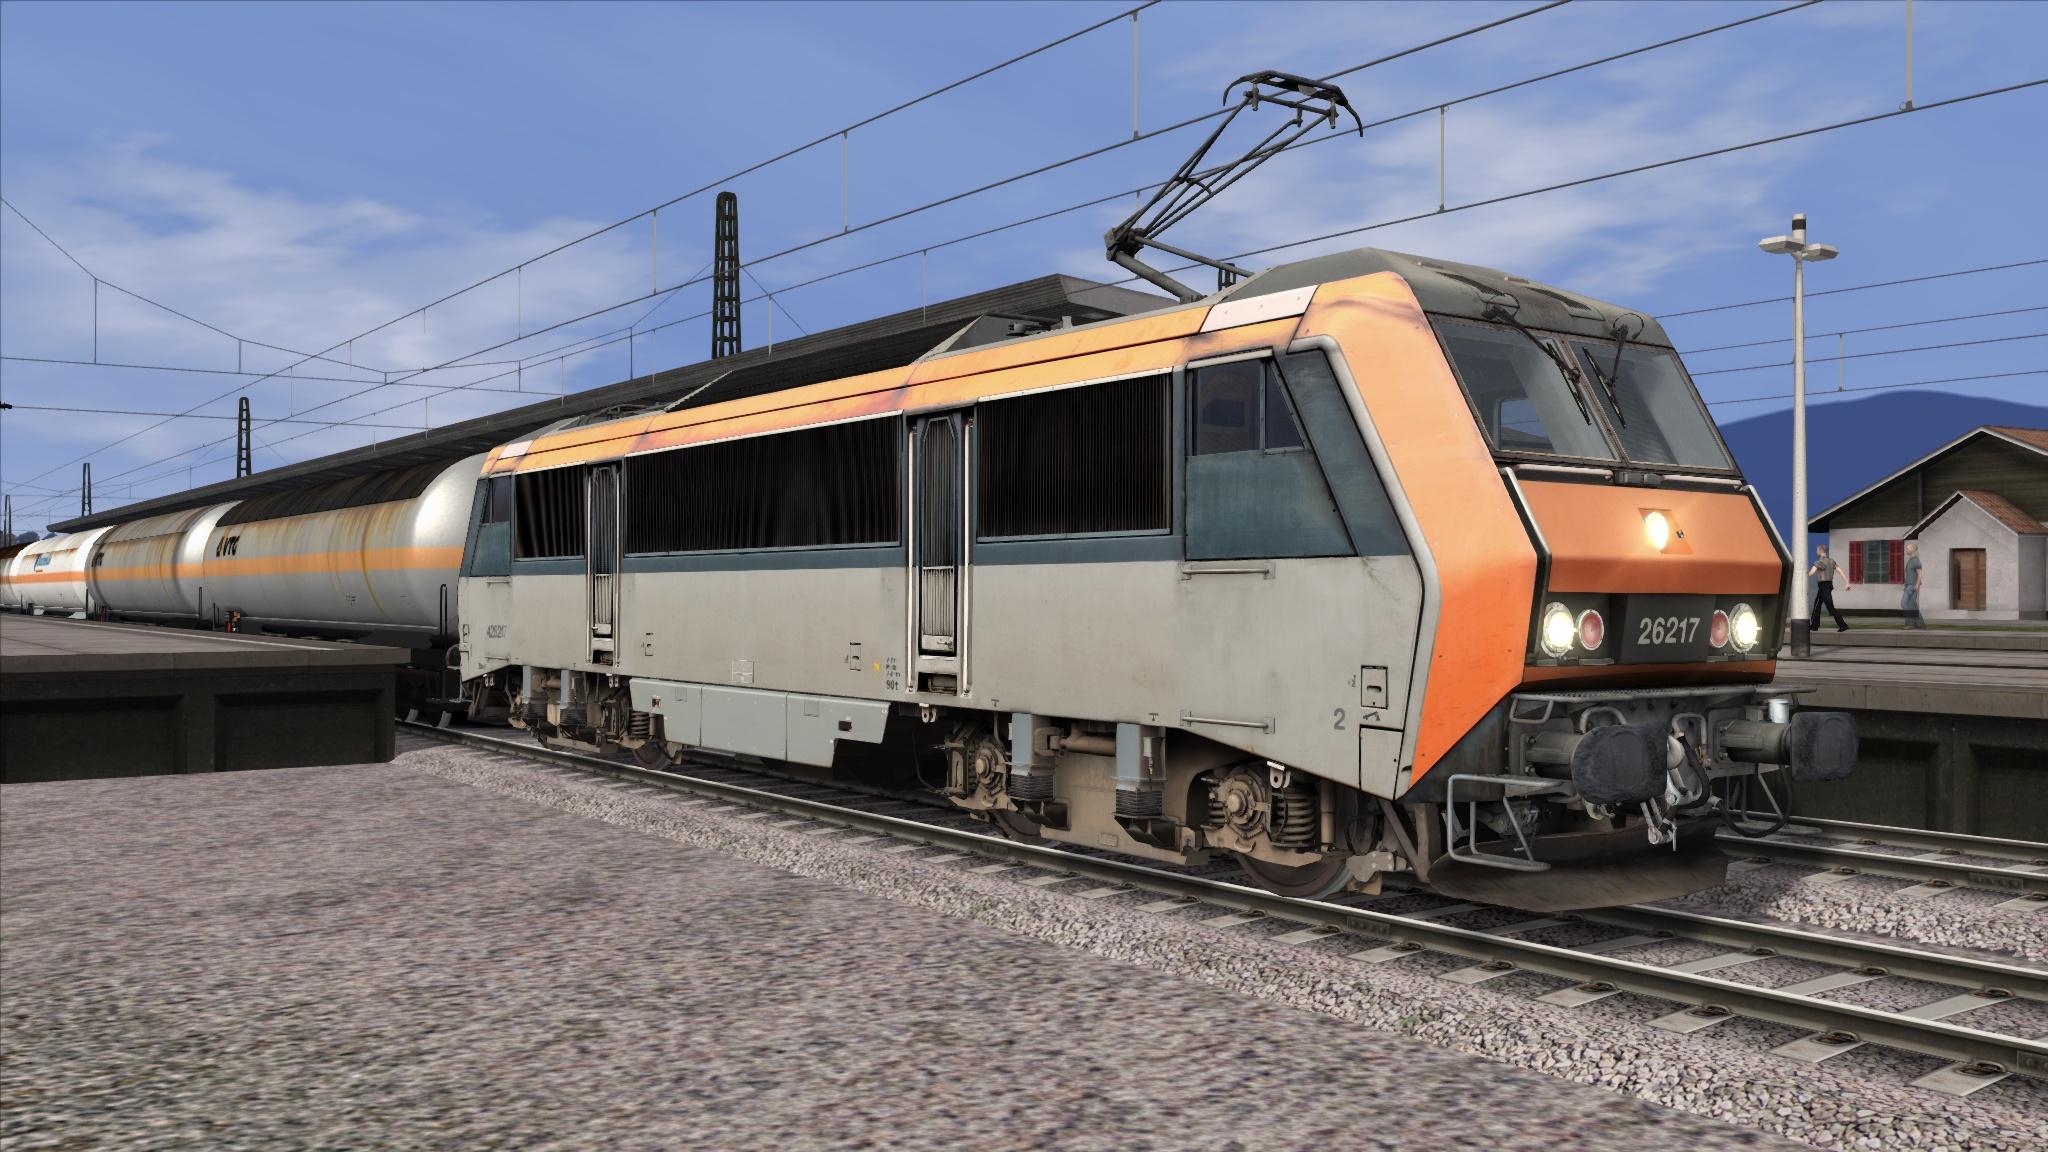 Screenshot-Seebergbahn-46-68545-7-68044-